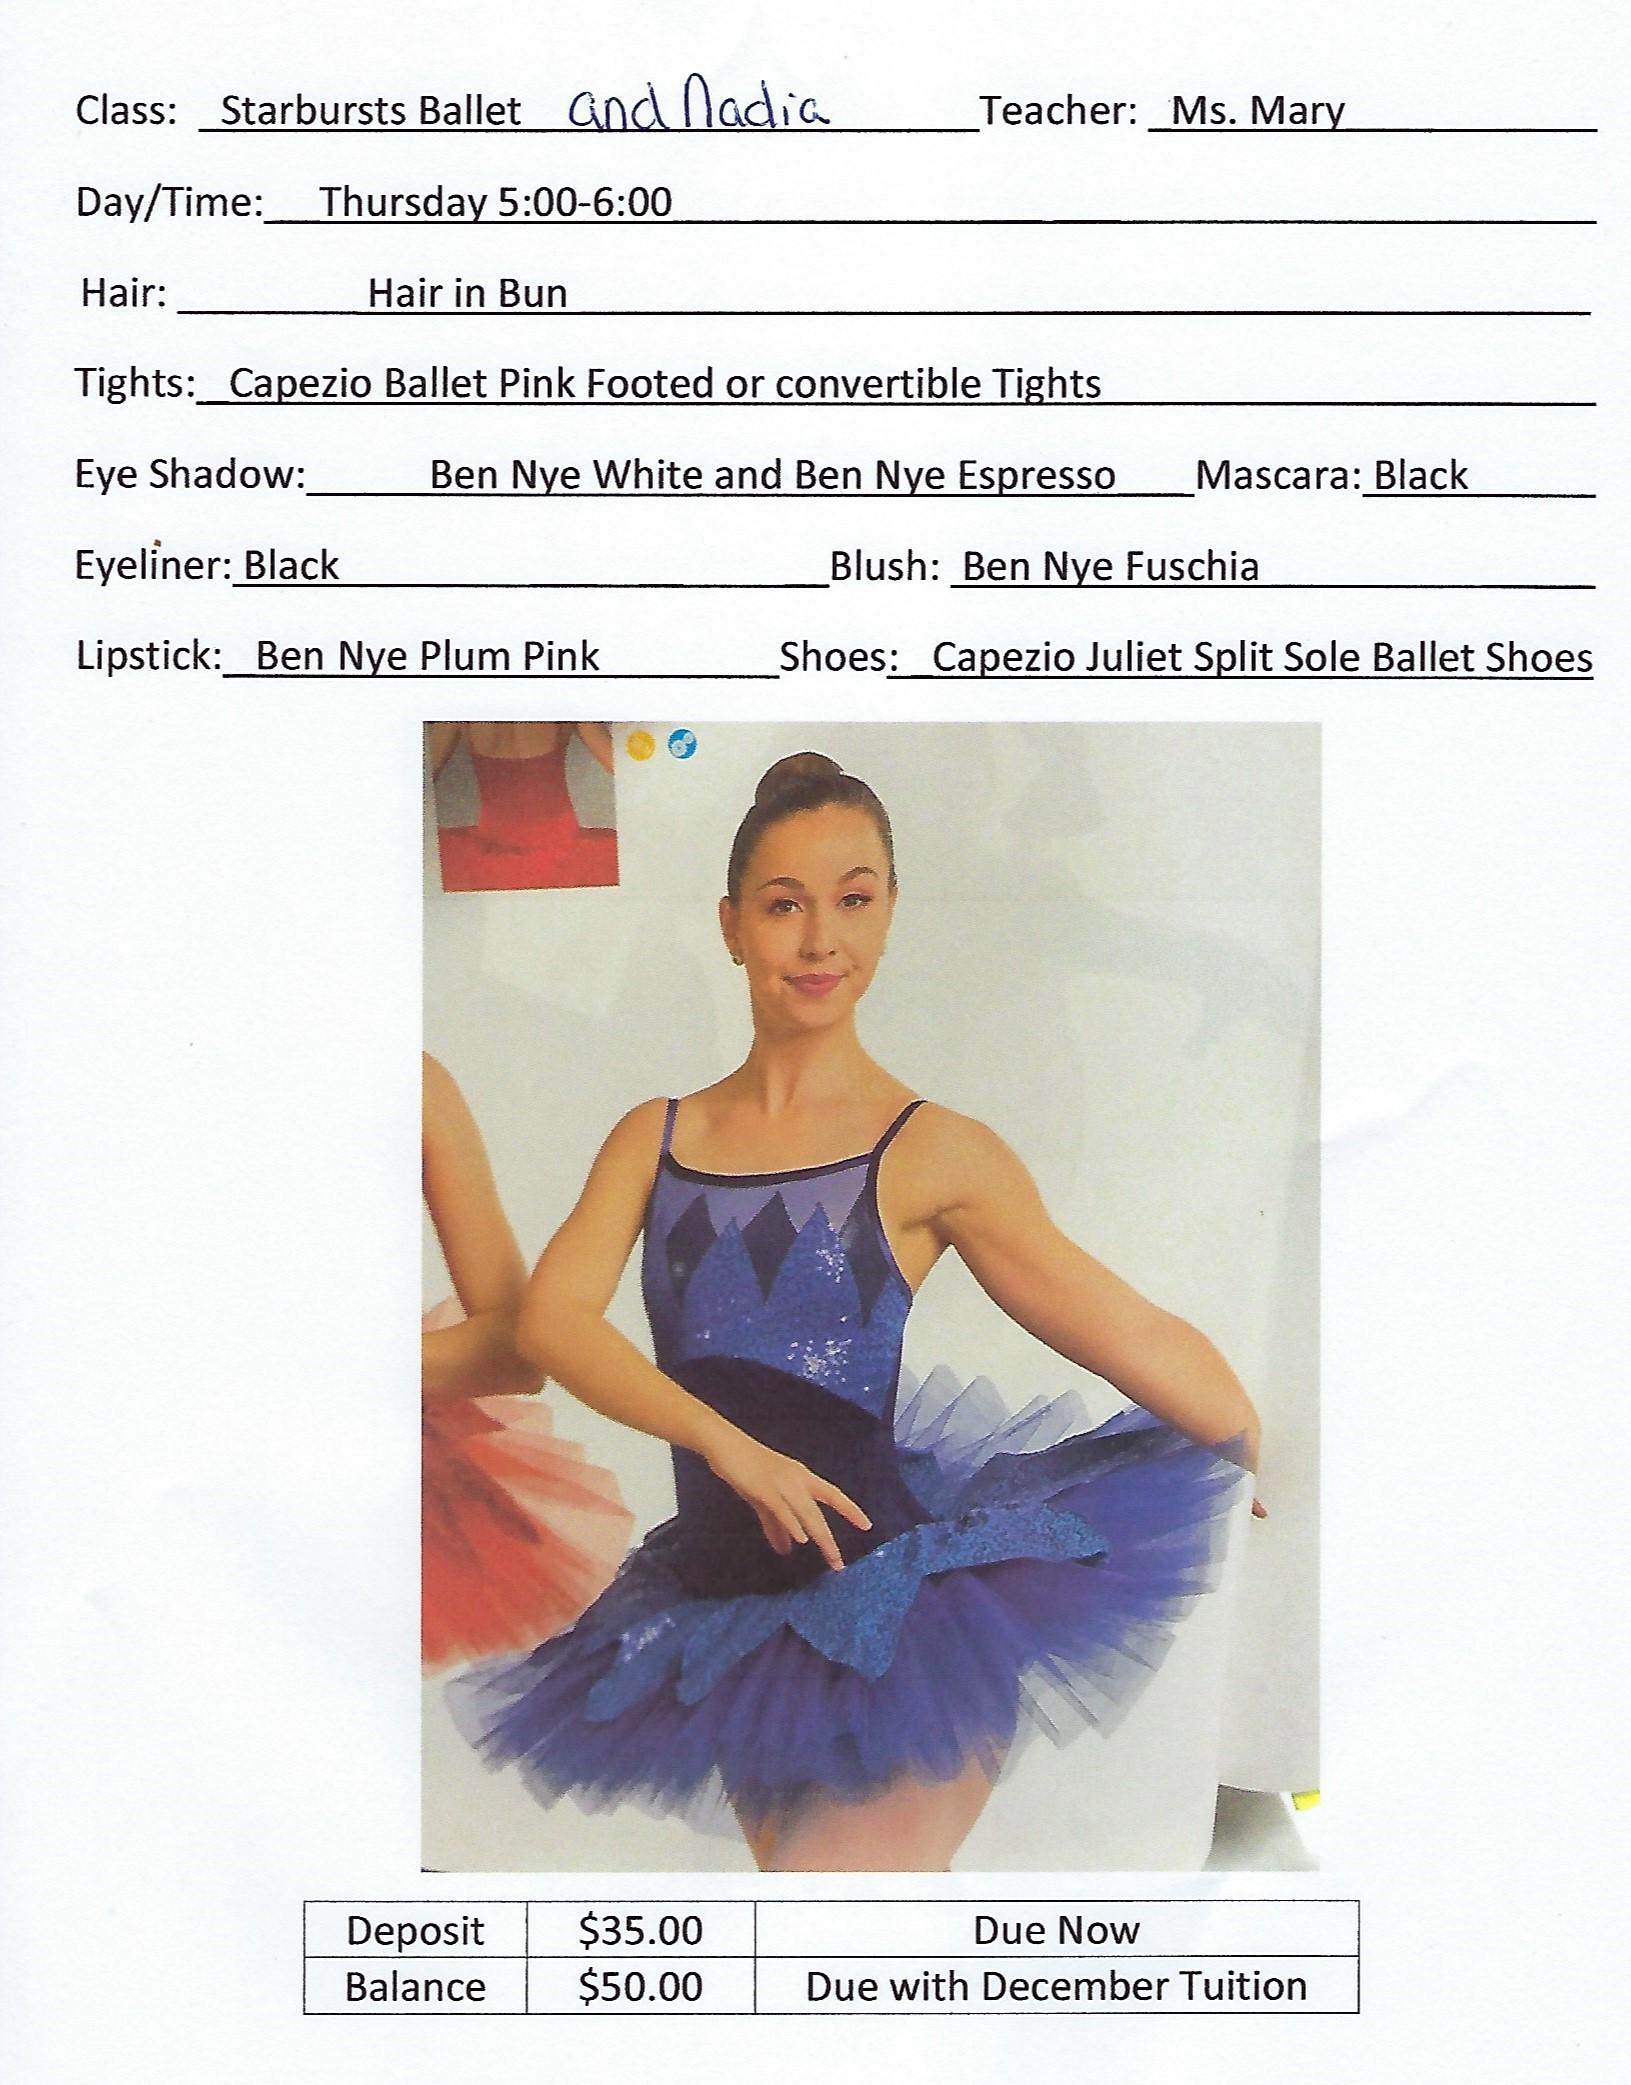 Starbursts Ballet